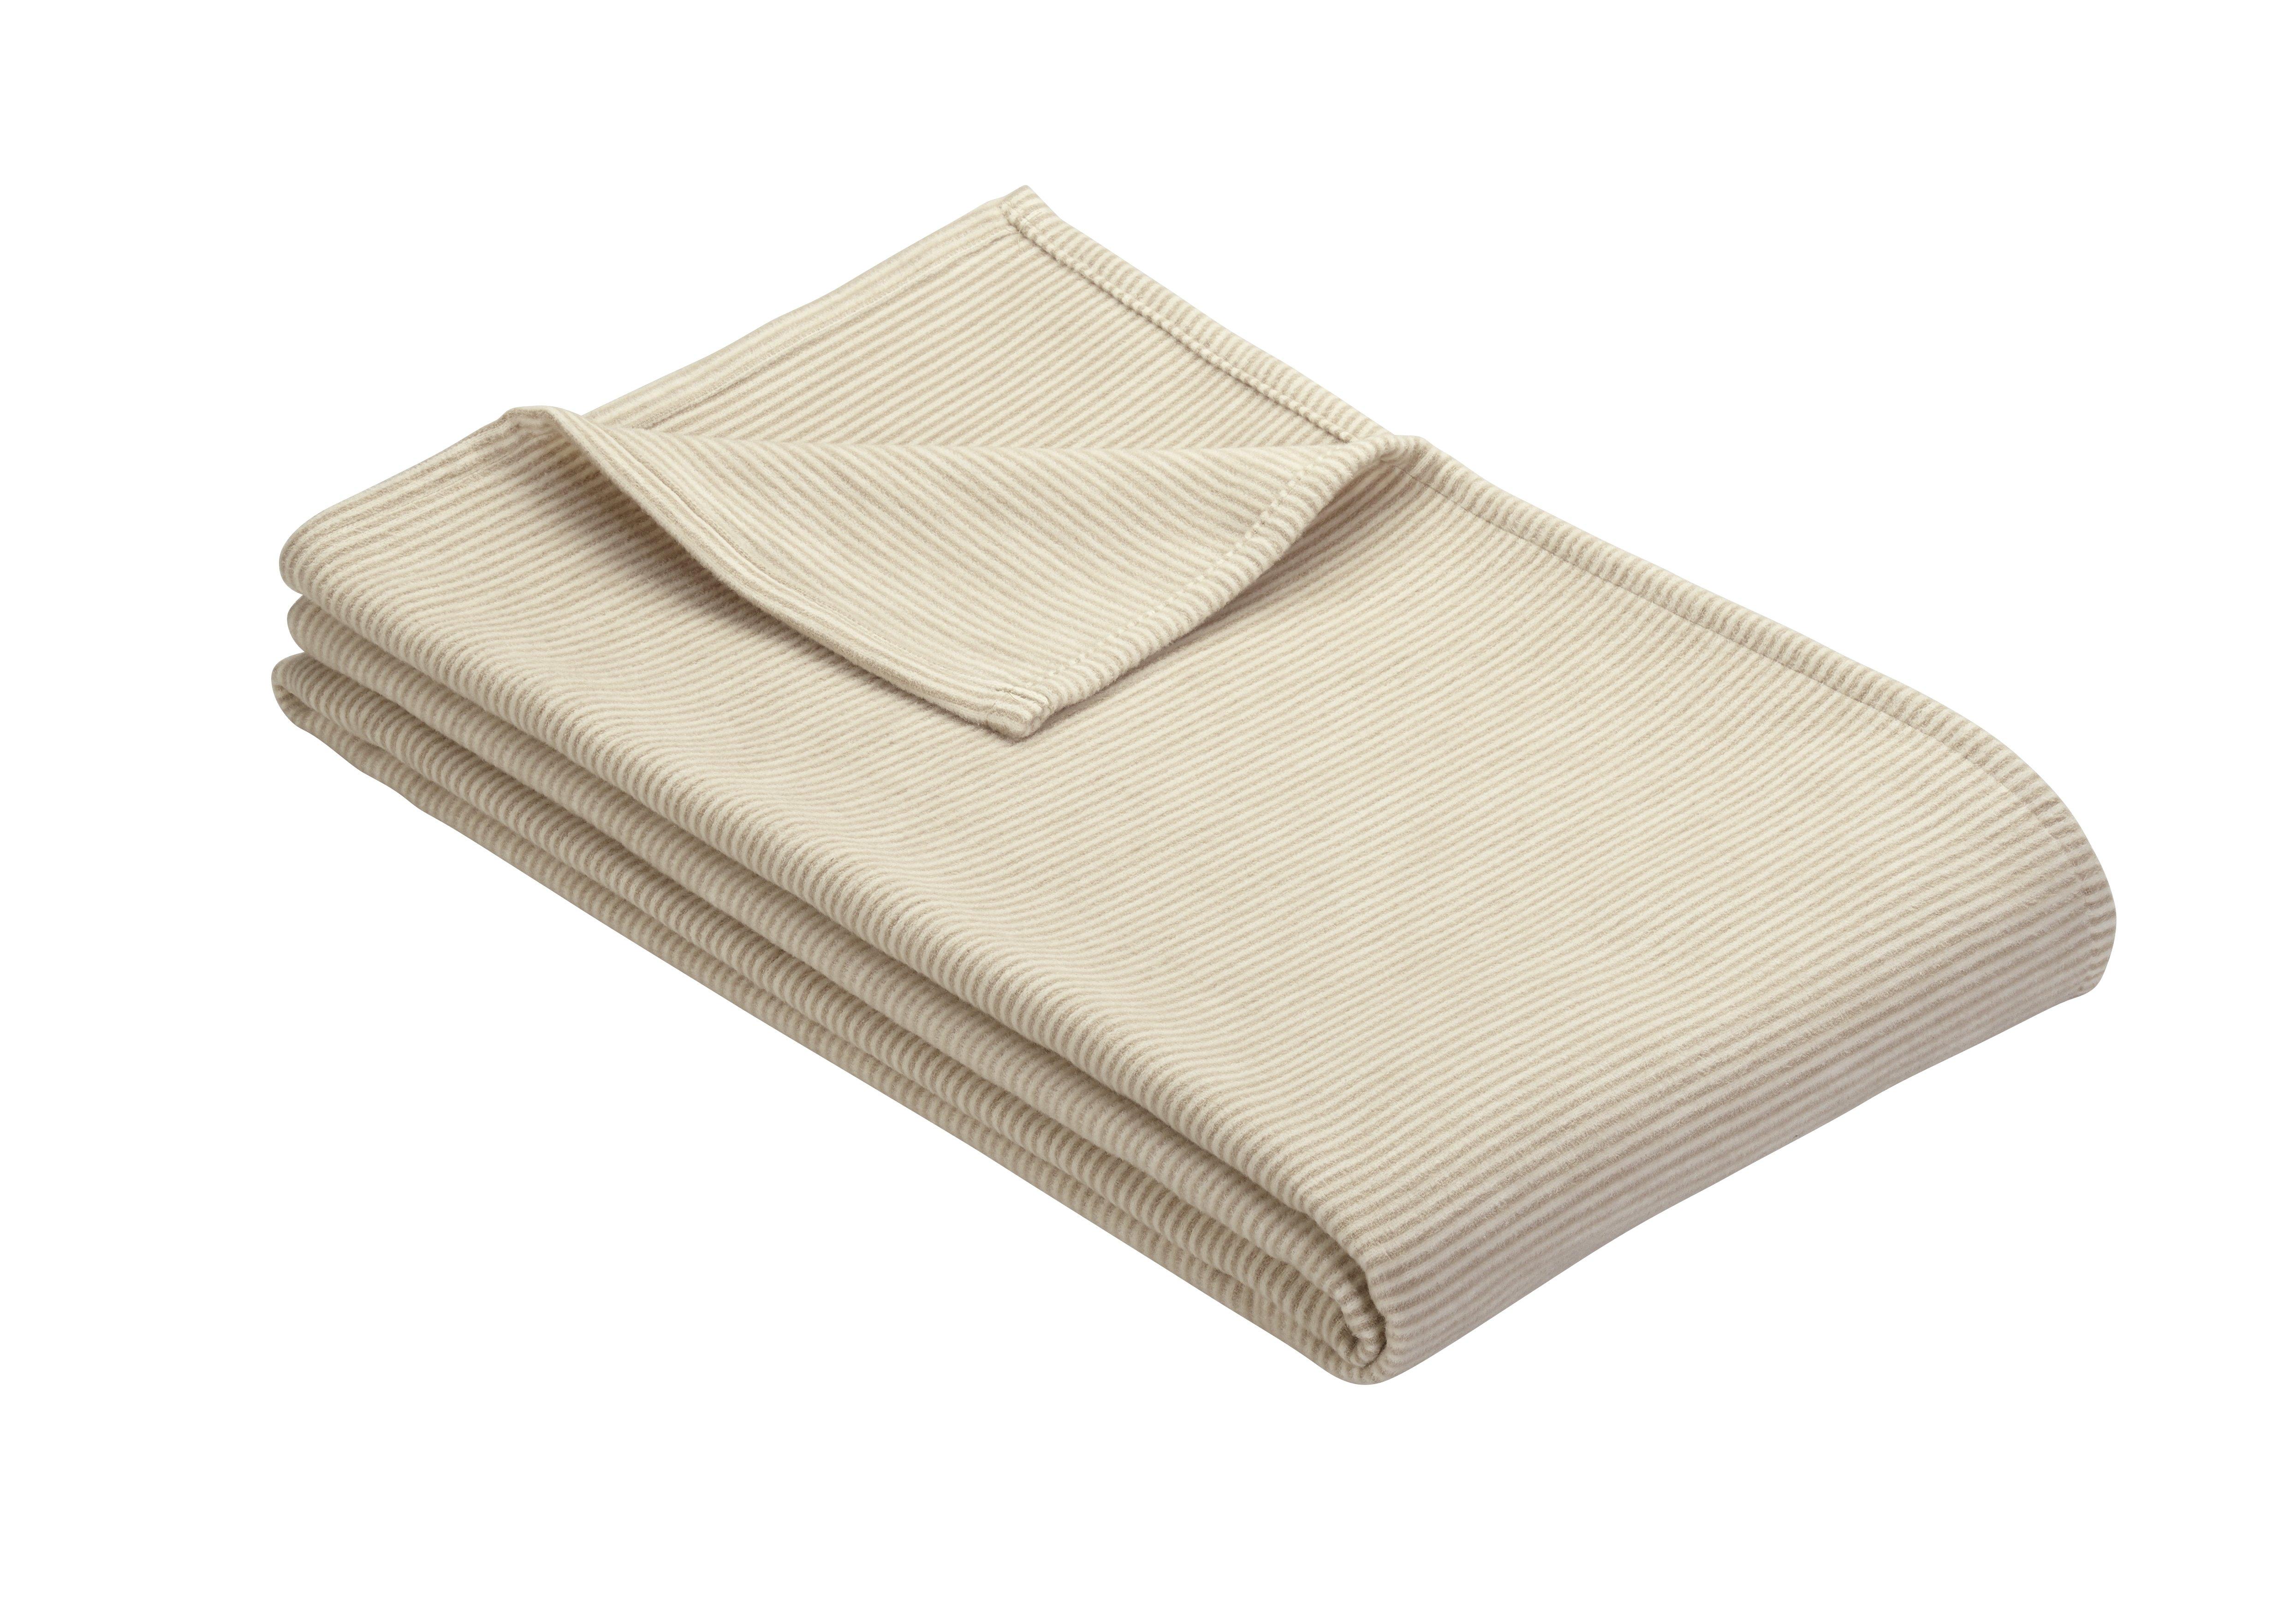 Jacq. Decke Turin mit GOTS-Zertifikat Sand 140x200 cm